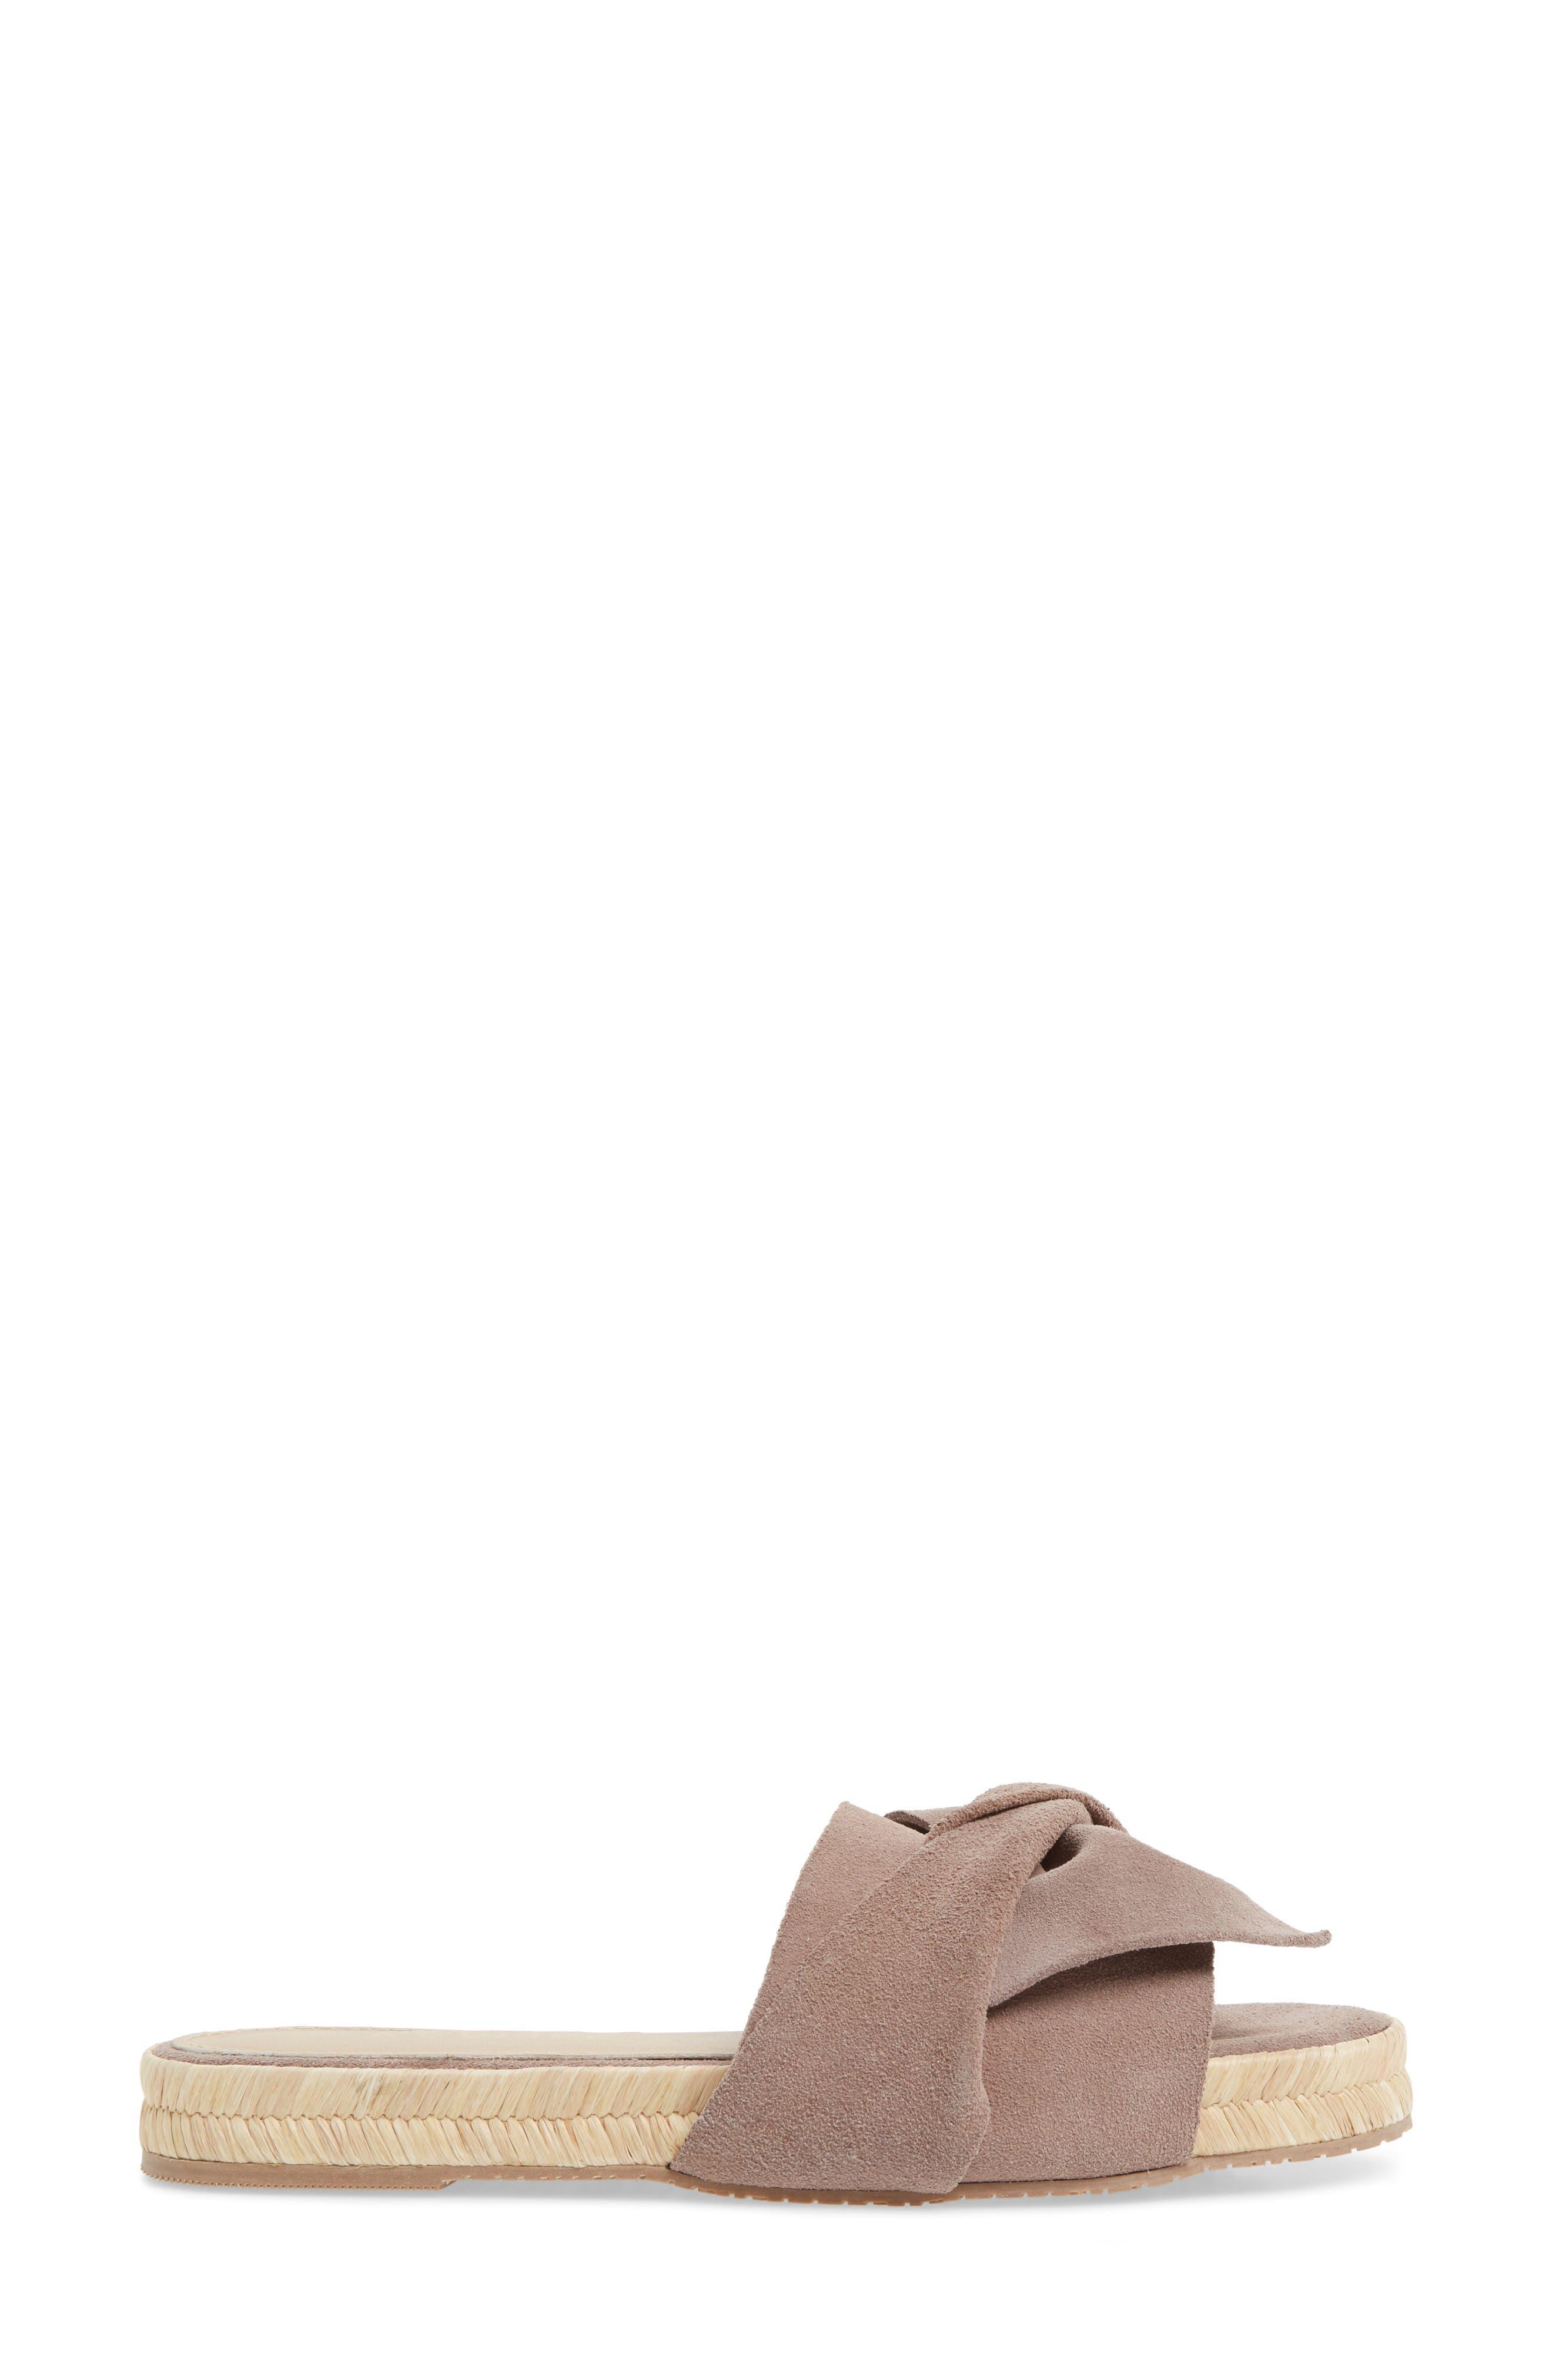 Sayulita Knotted Slide Sandal,                             Alternate thumbnail 3, color,                             500